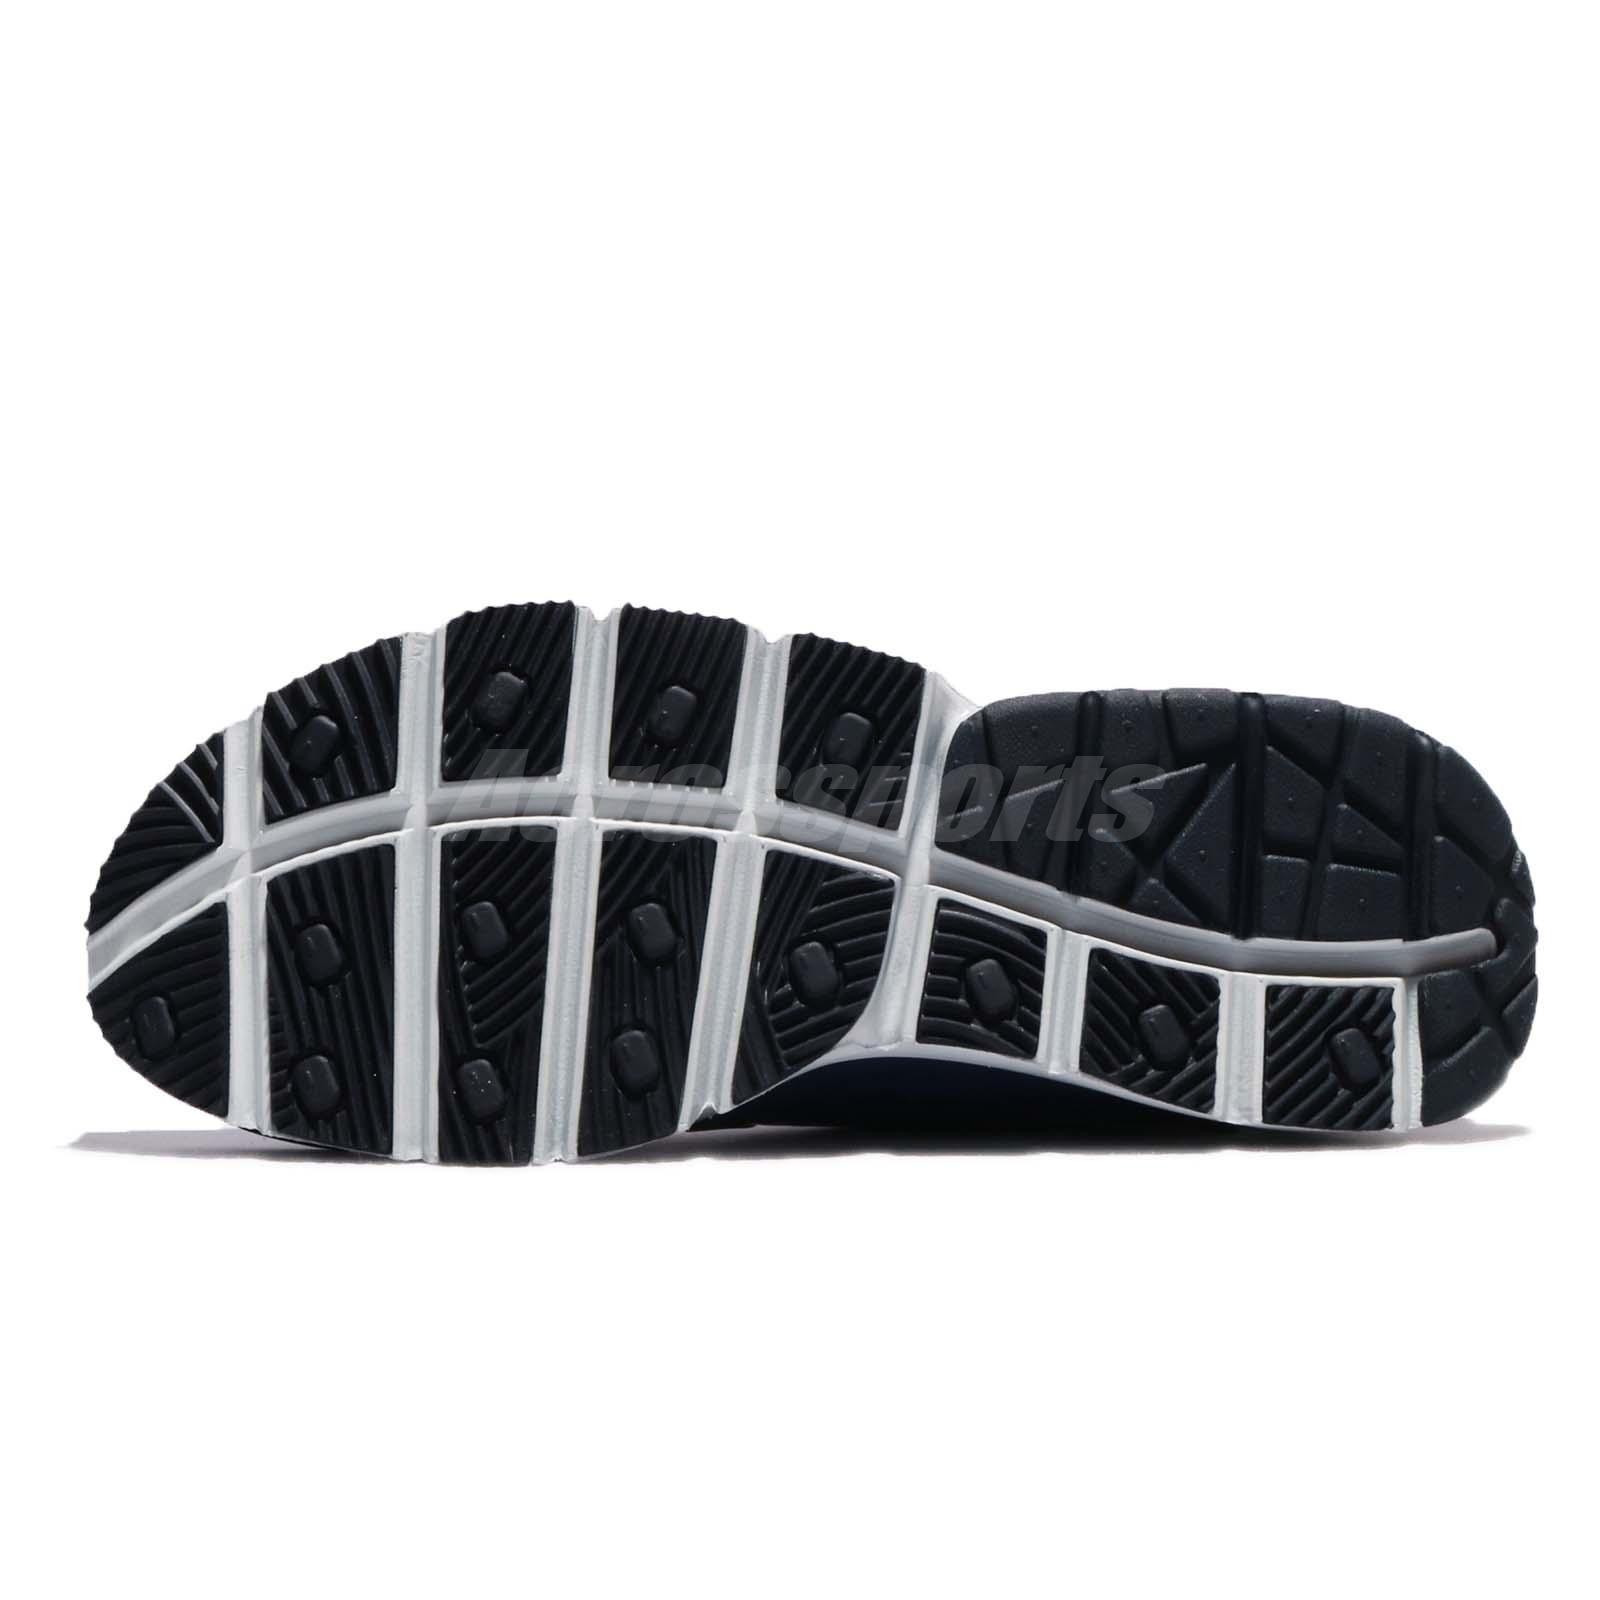 huge discount b341b 2734b Nike Sock Dart Mid SE Gym Blue Binary Men Casual Shoes Sneakers ...